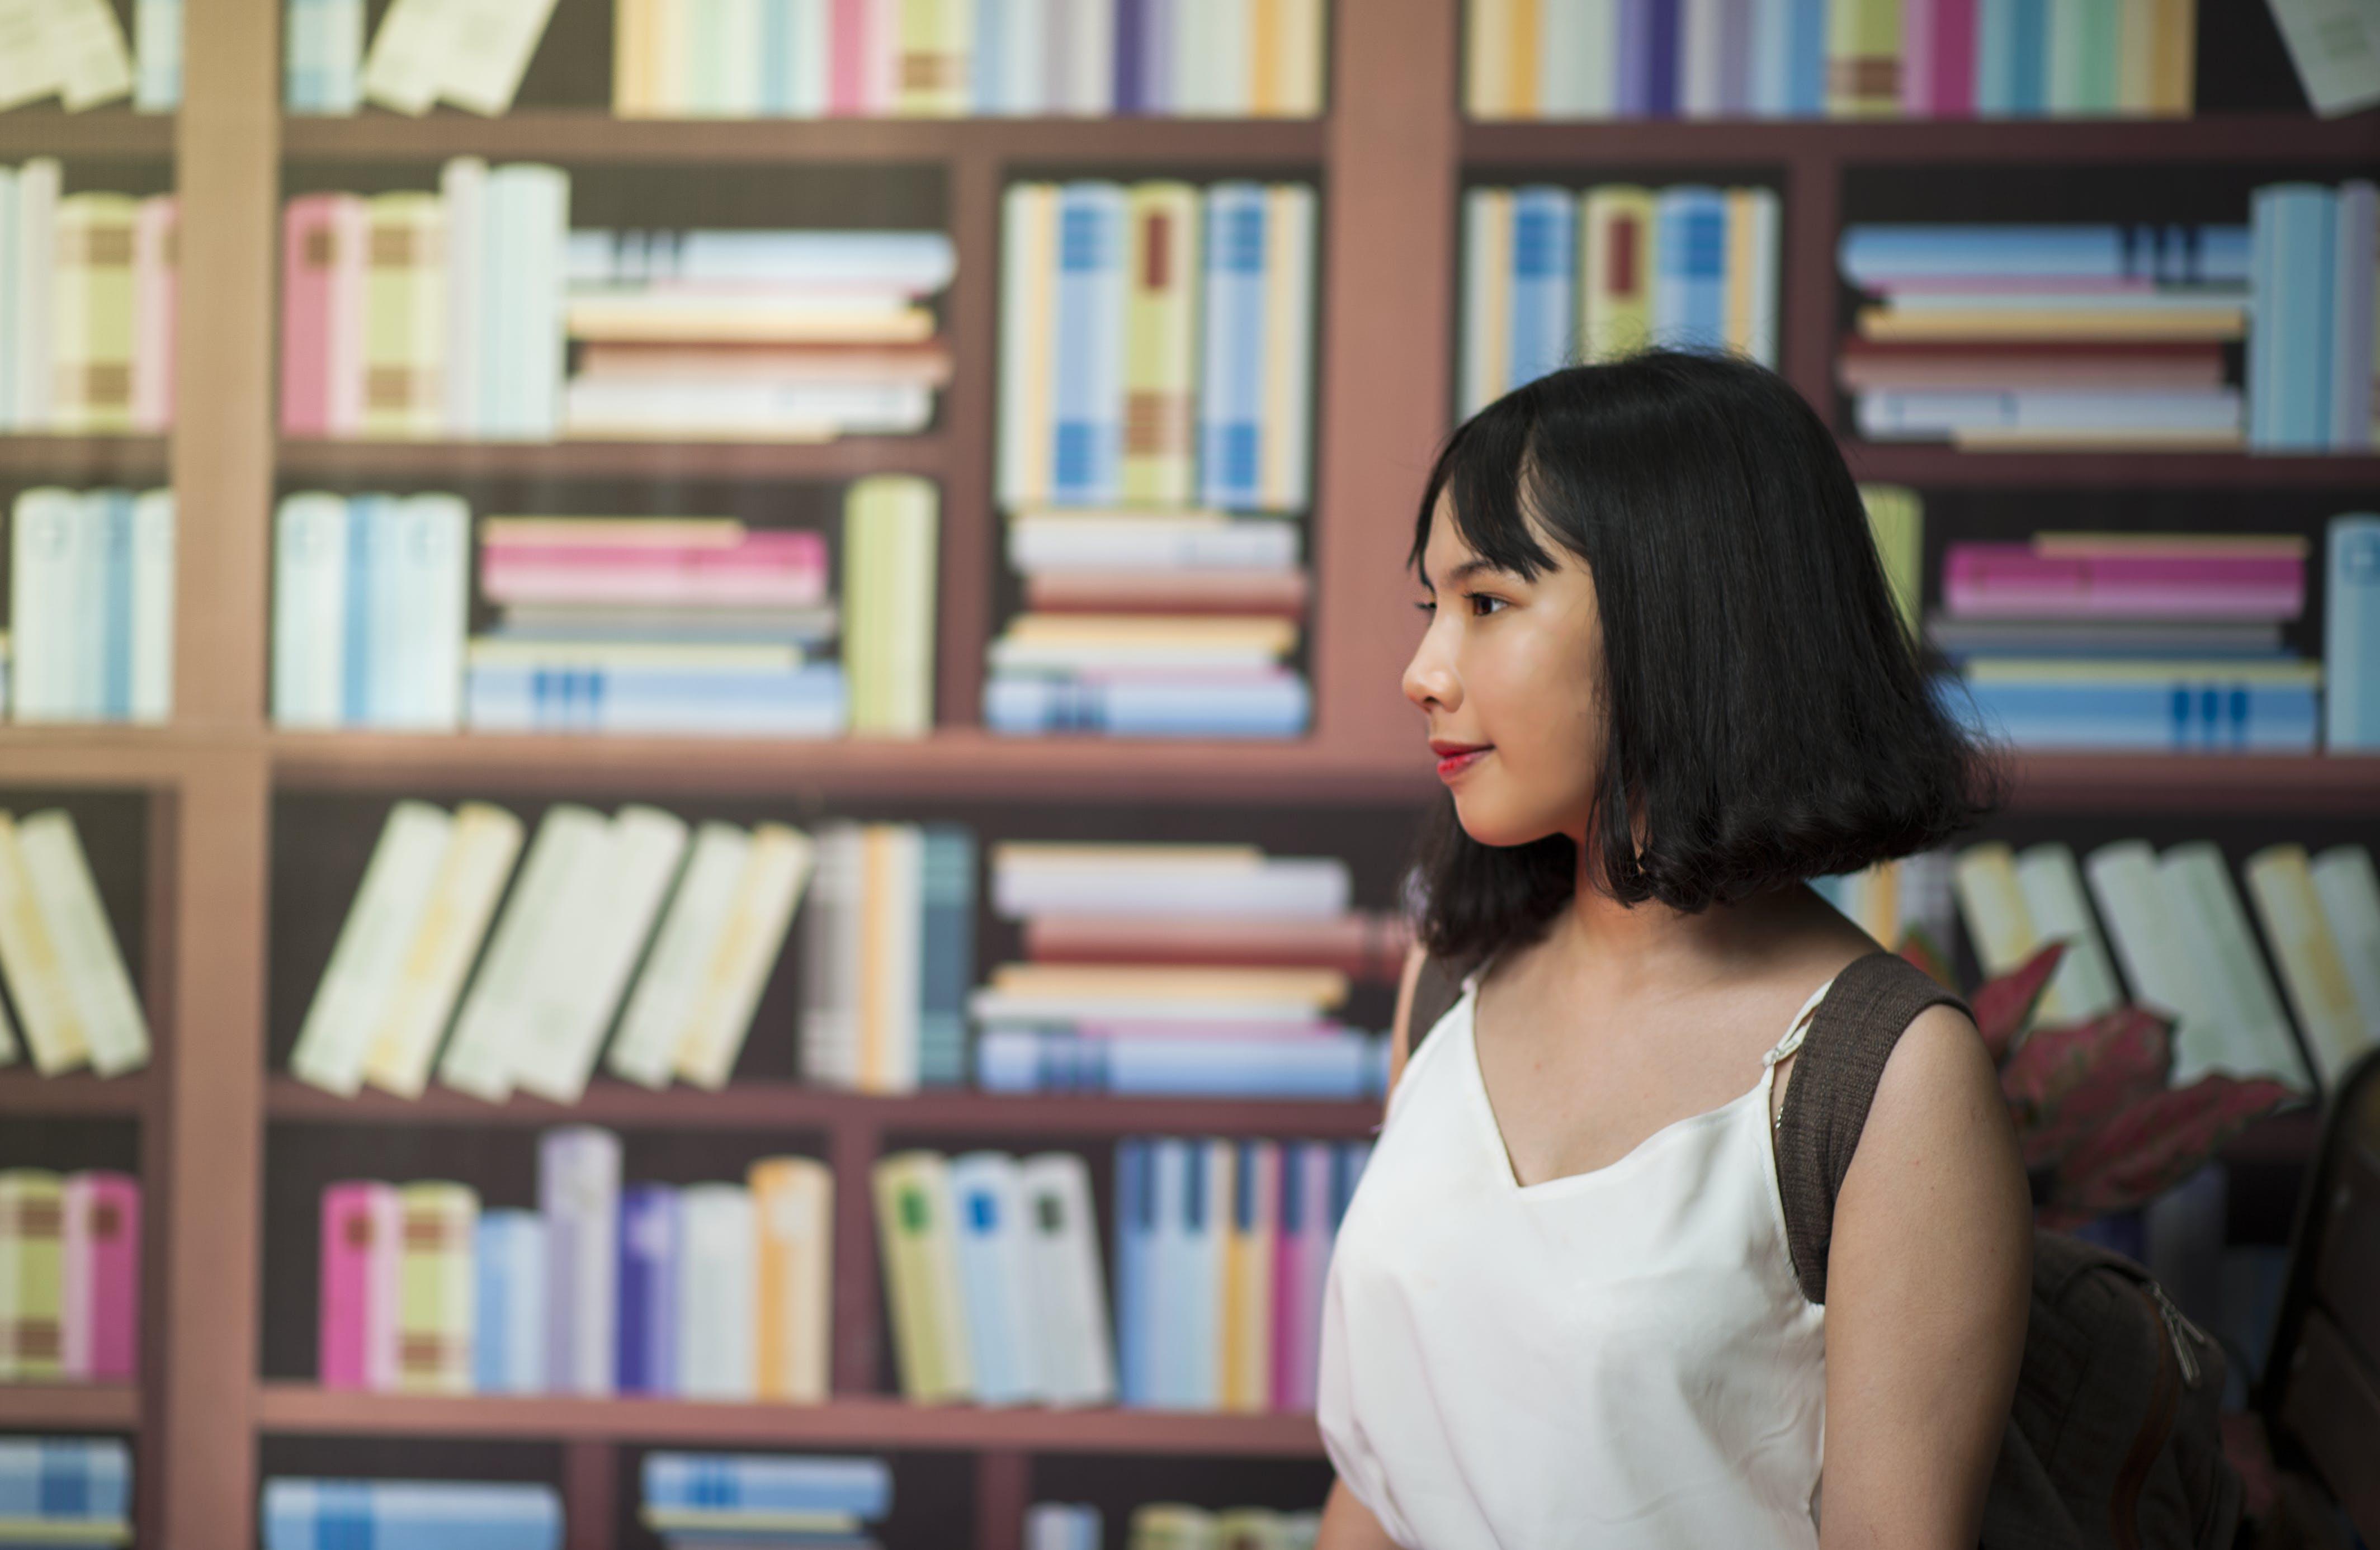 Woman Wearing V-neck Sleeveless Top Near Bookshelf